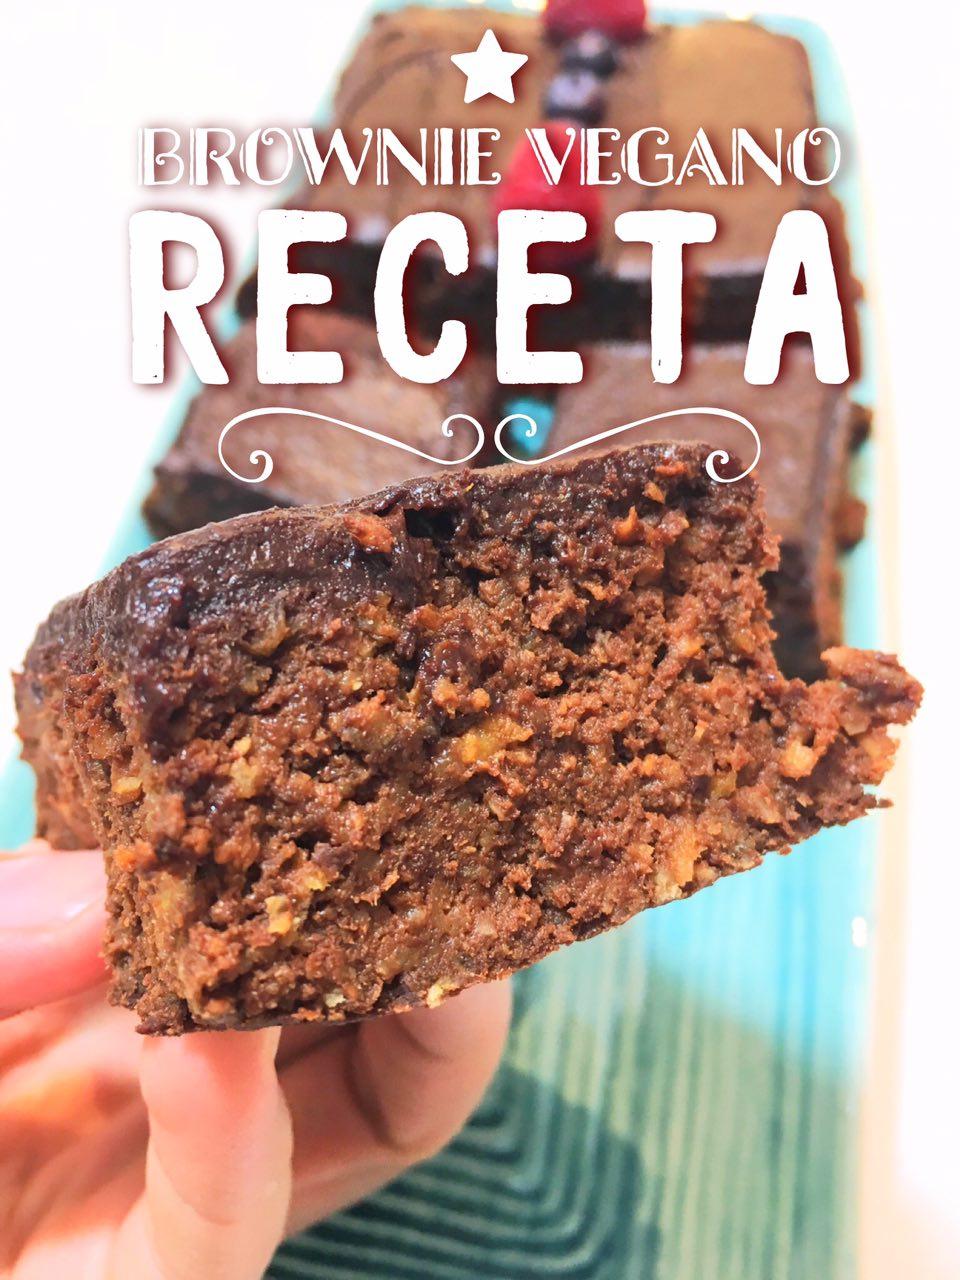 Brownie-vegano-receta